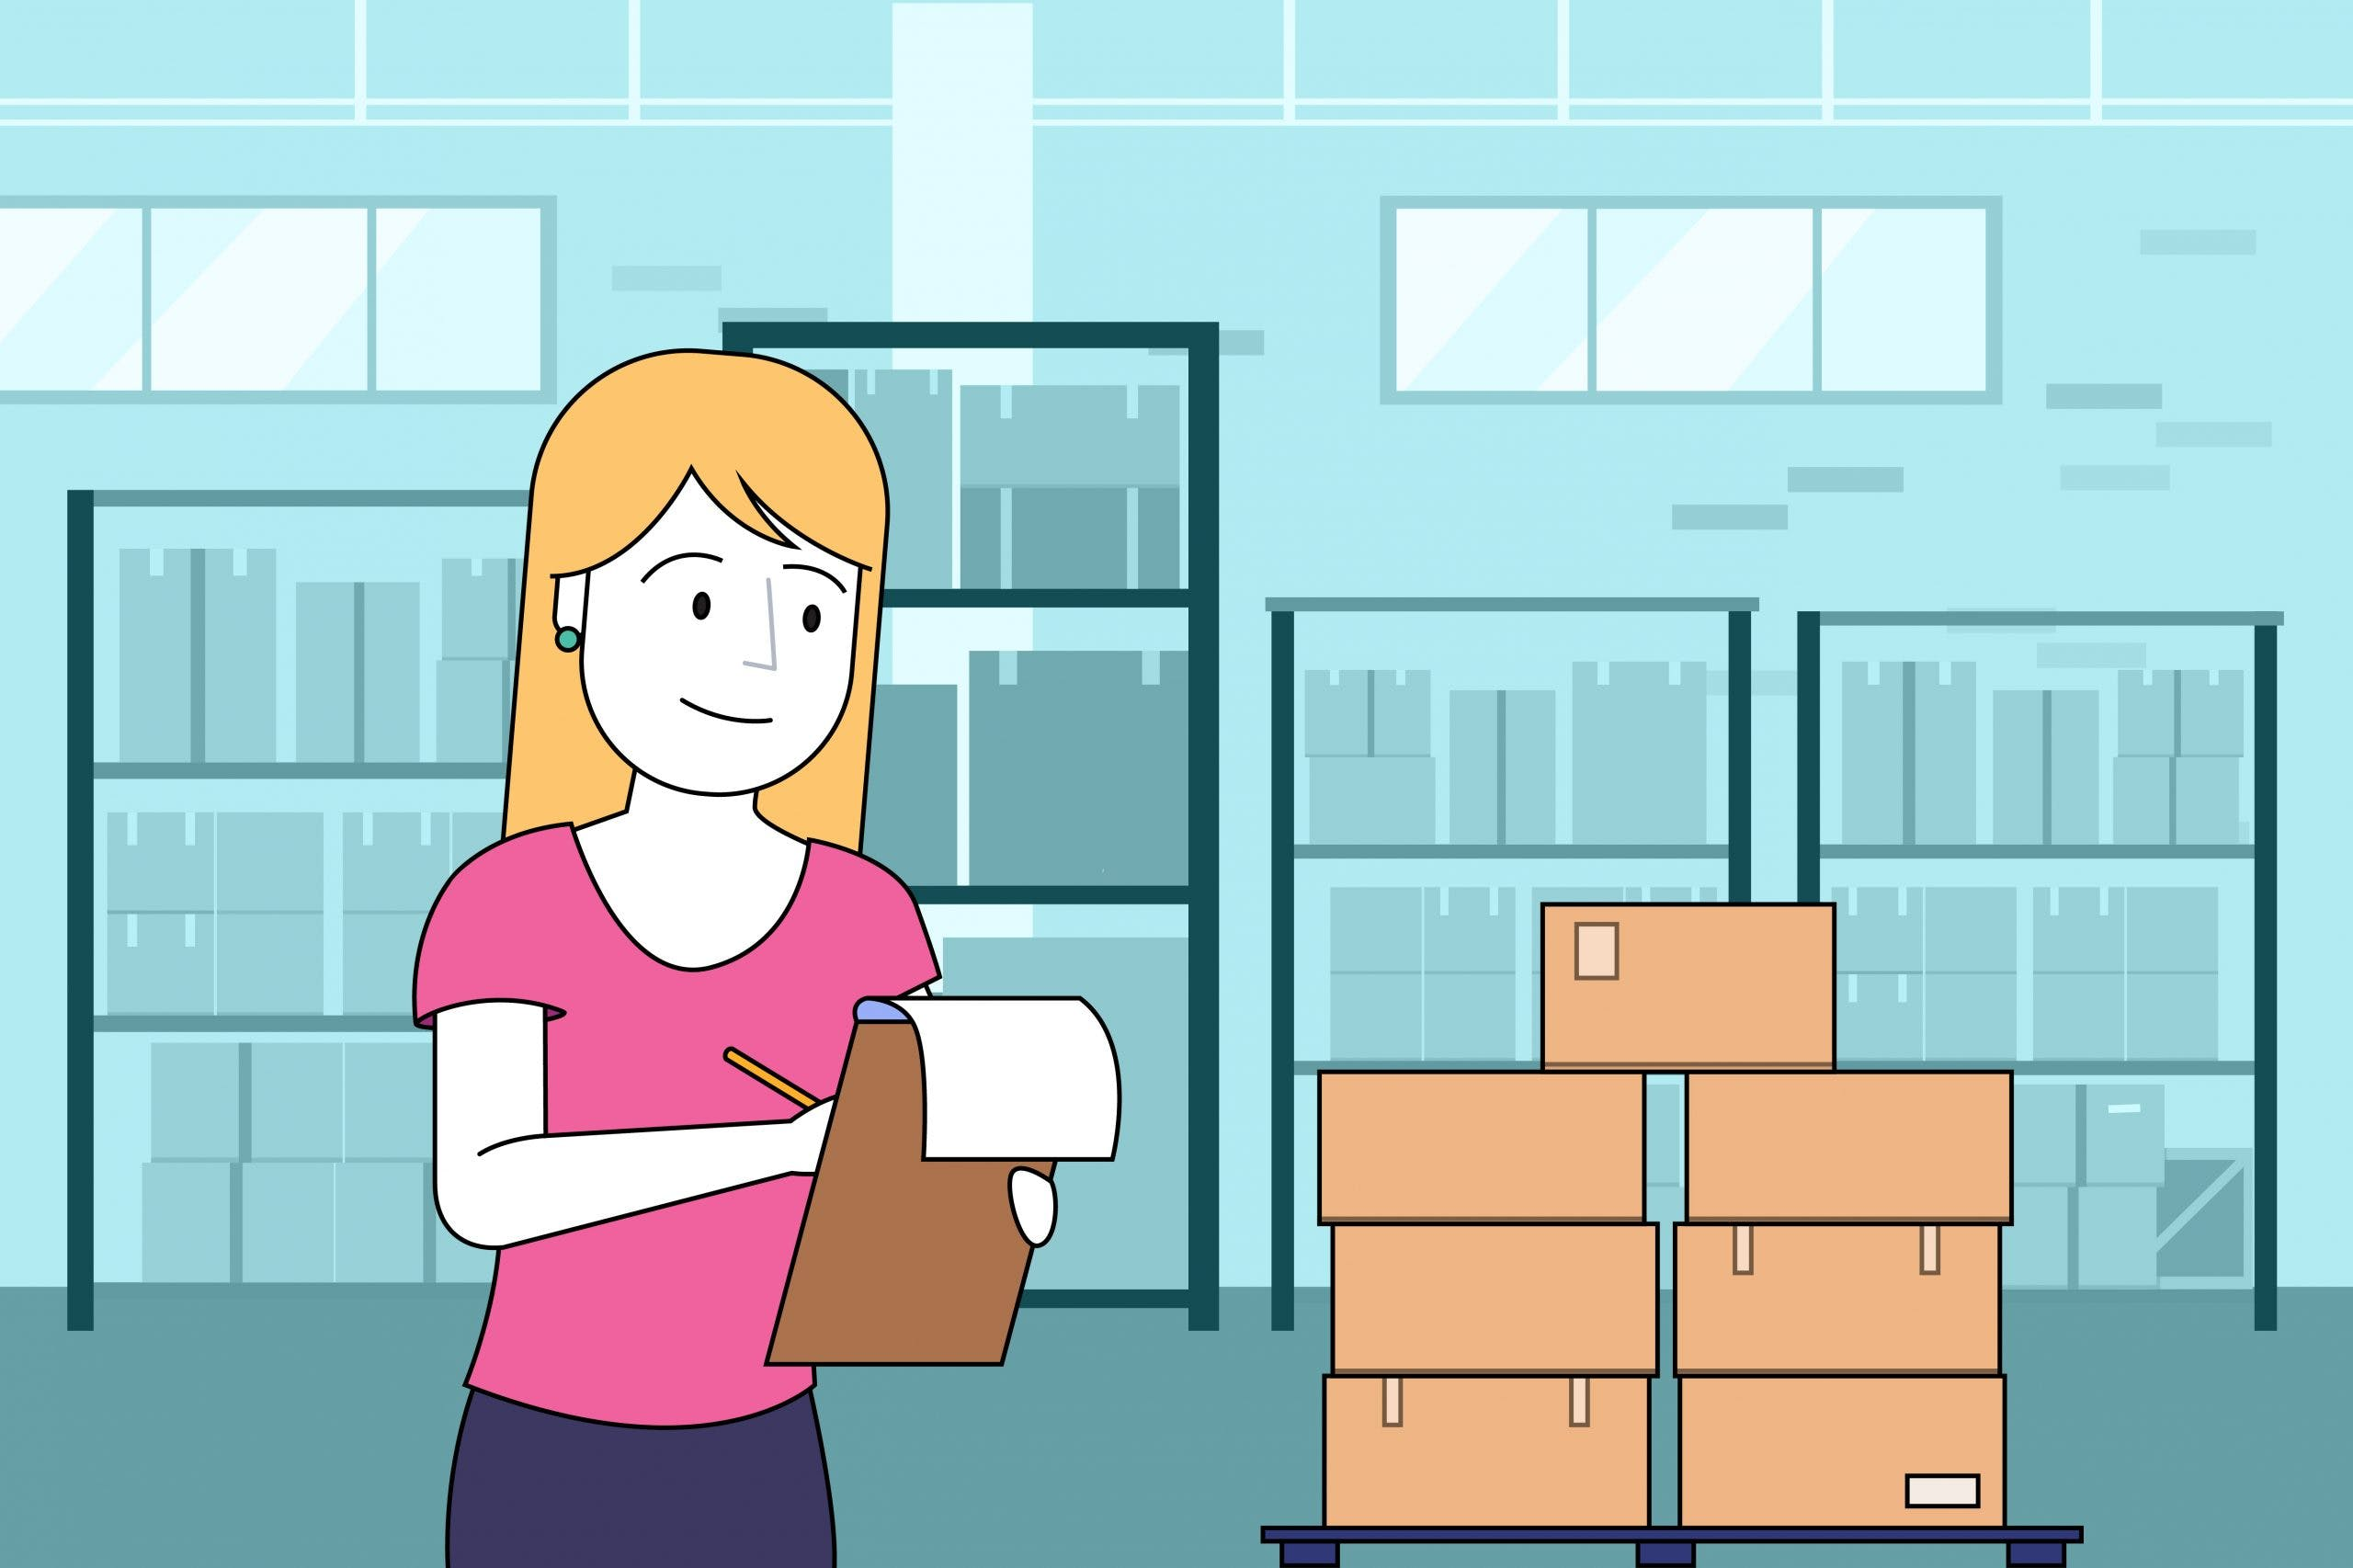 inventory management for emerging brands